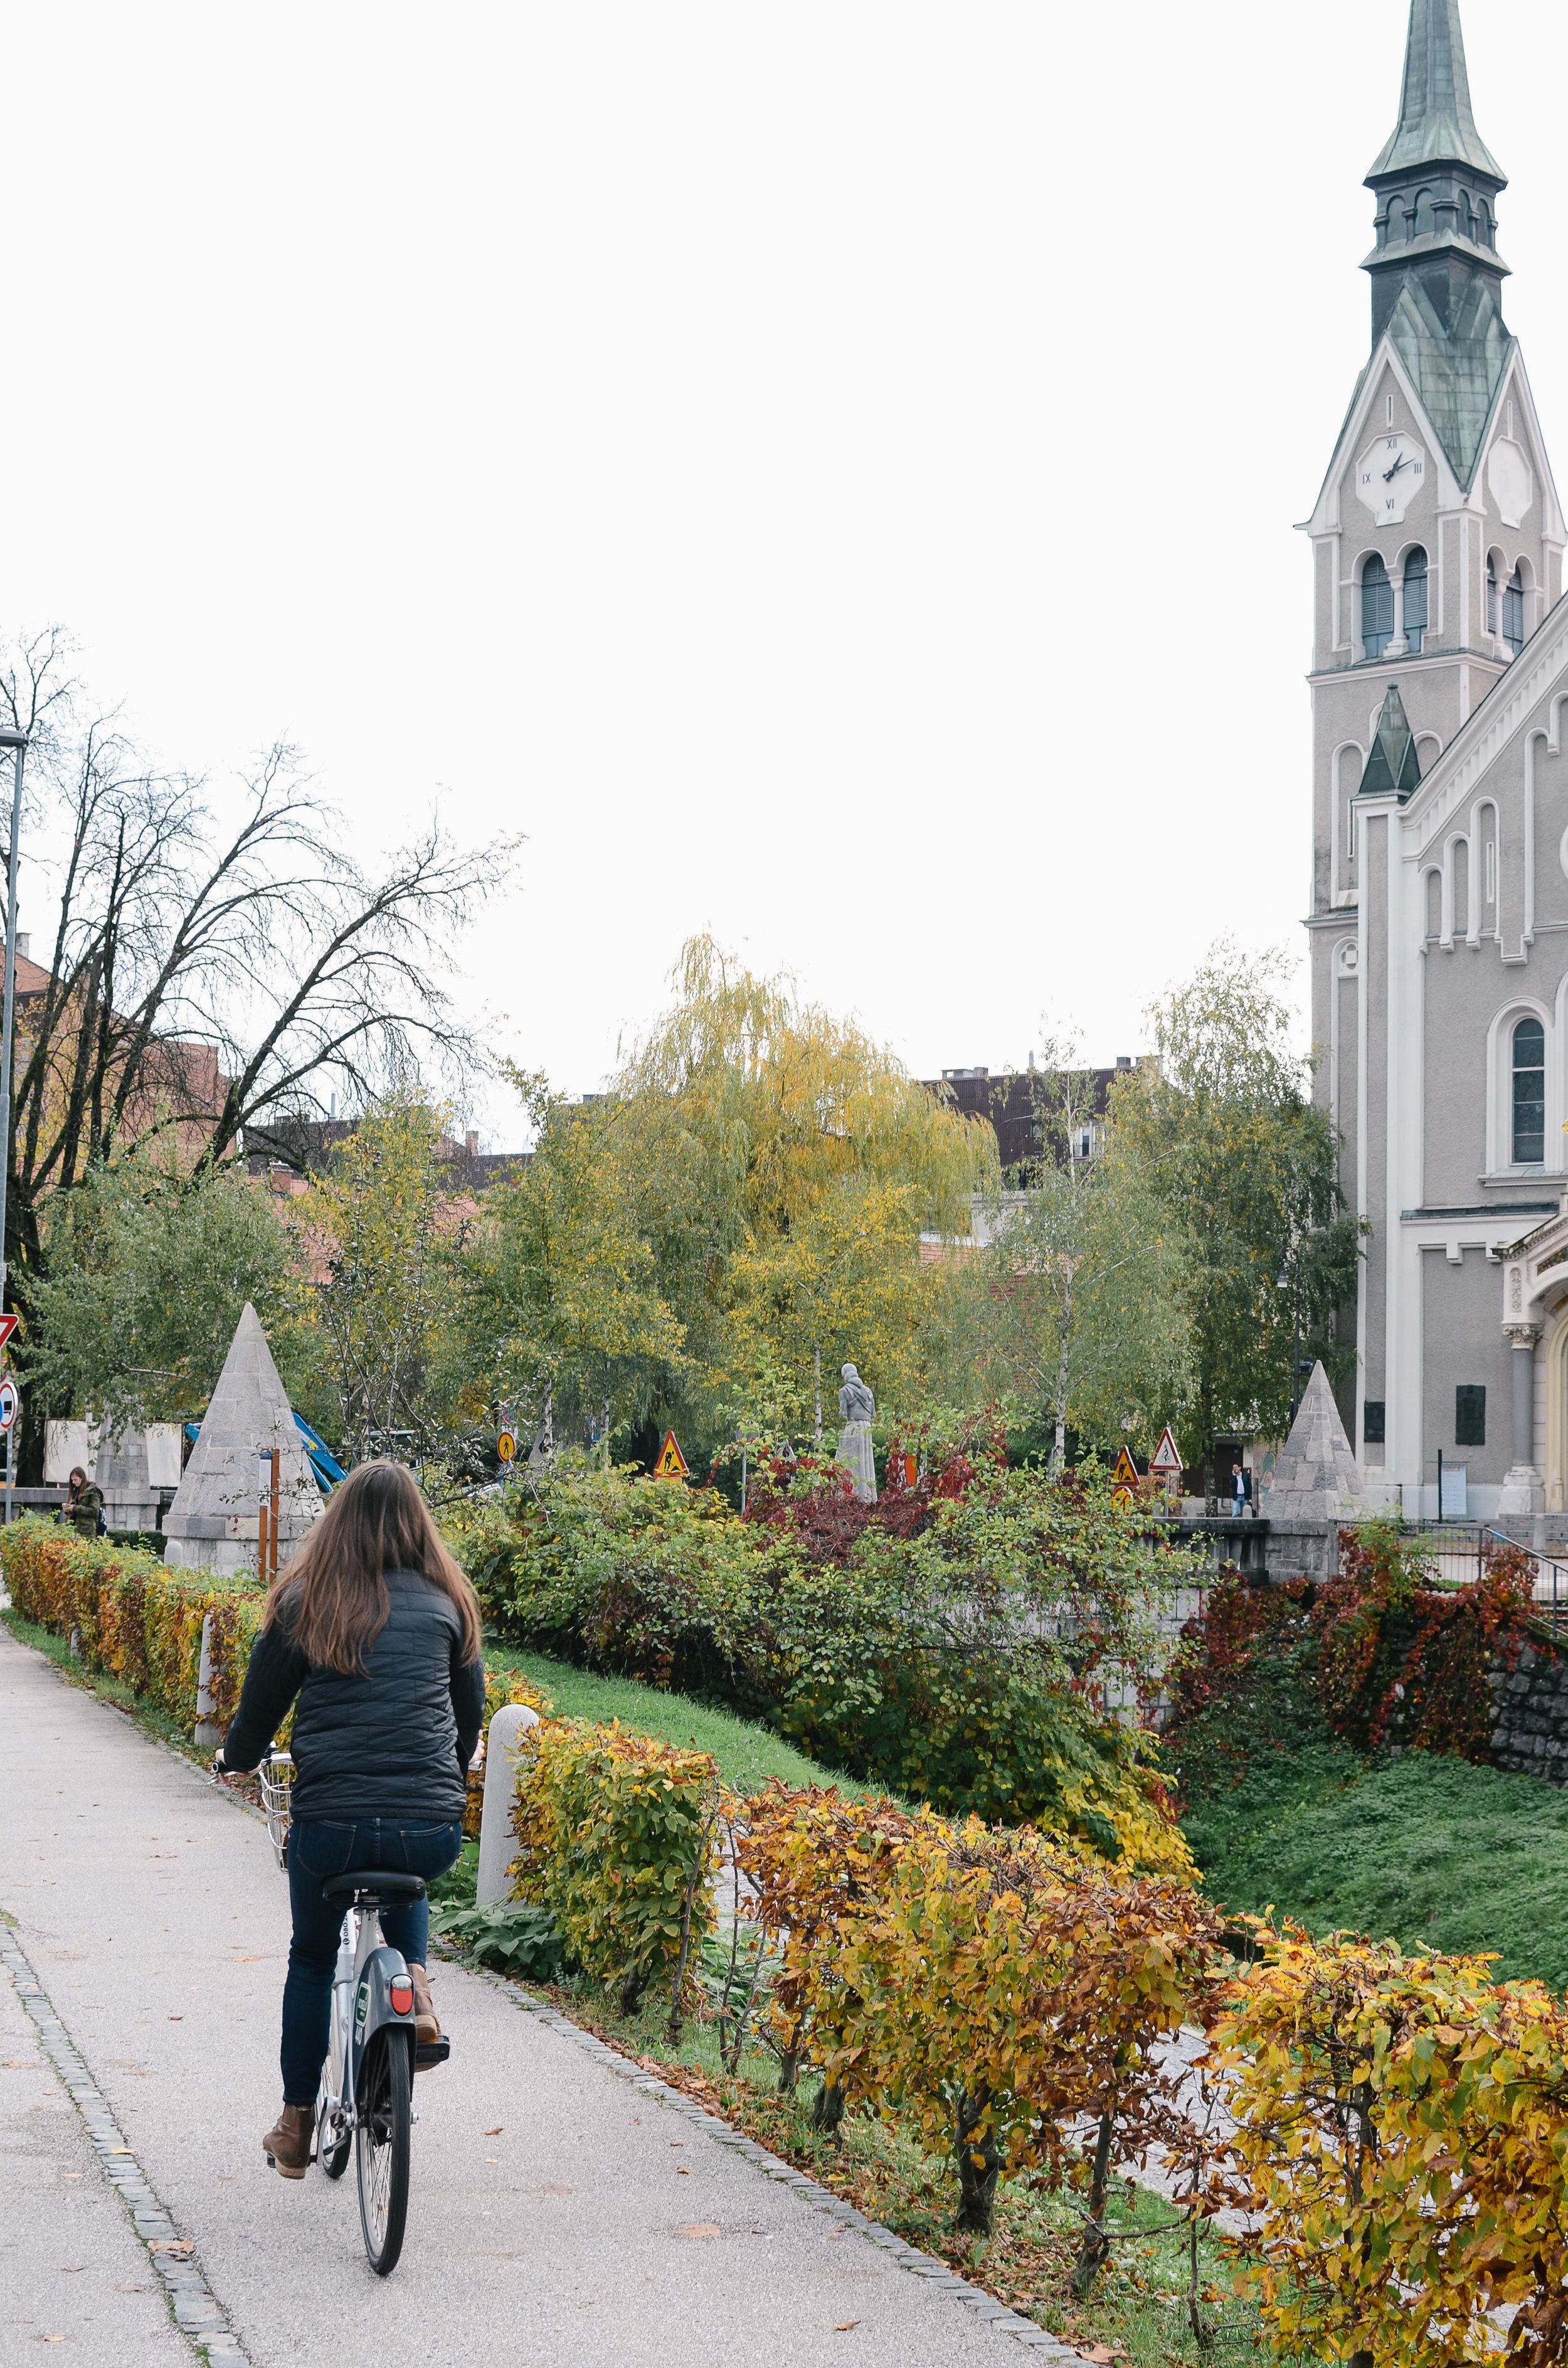 ljubljana-slovenia-travel-guide-lifeonpine_DSC_1734.jpg